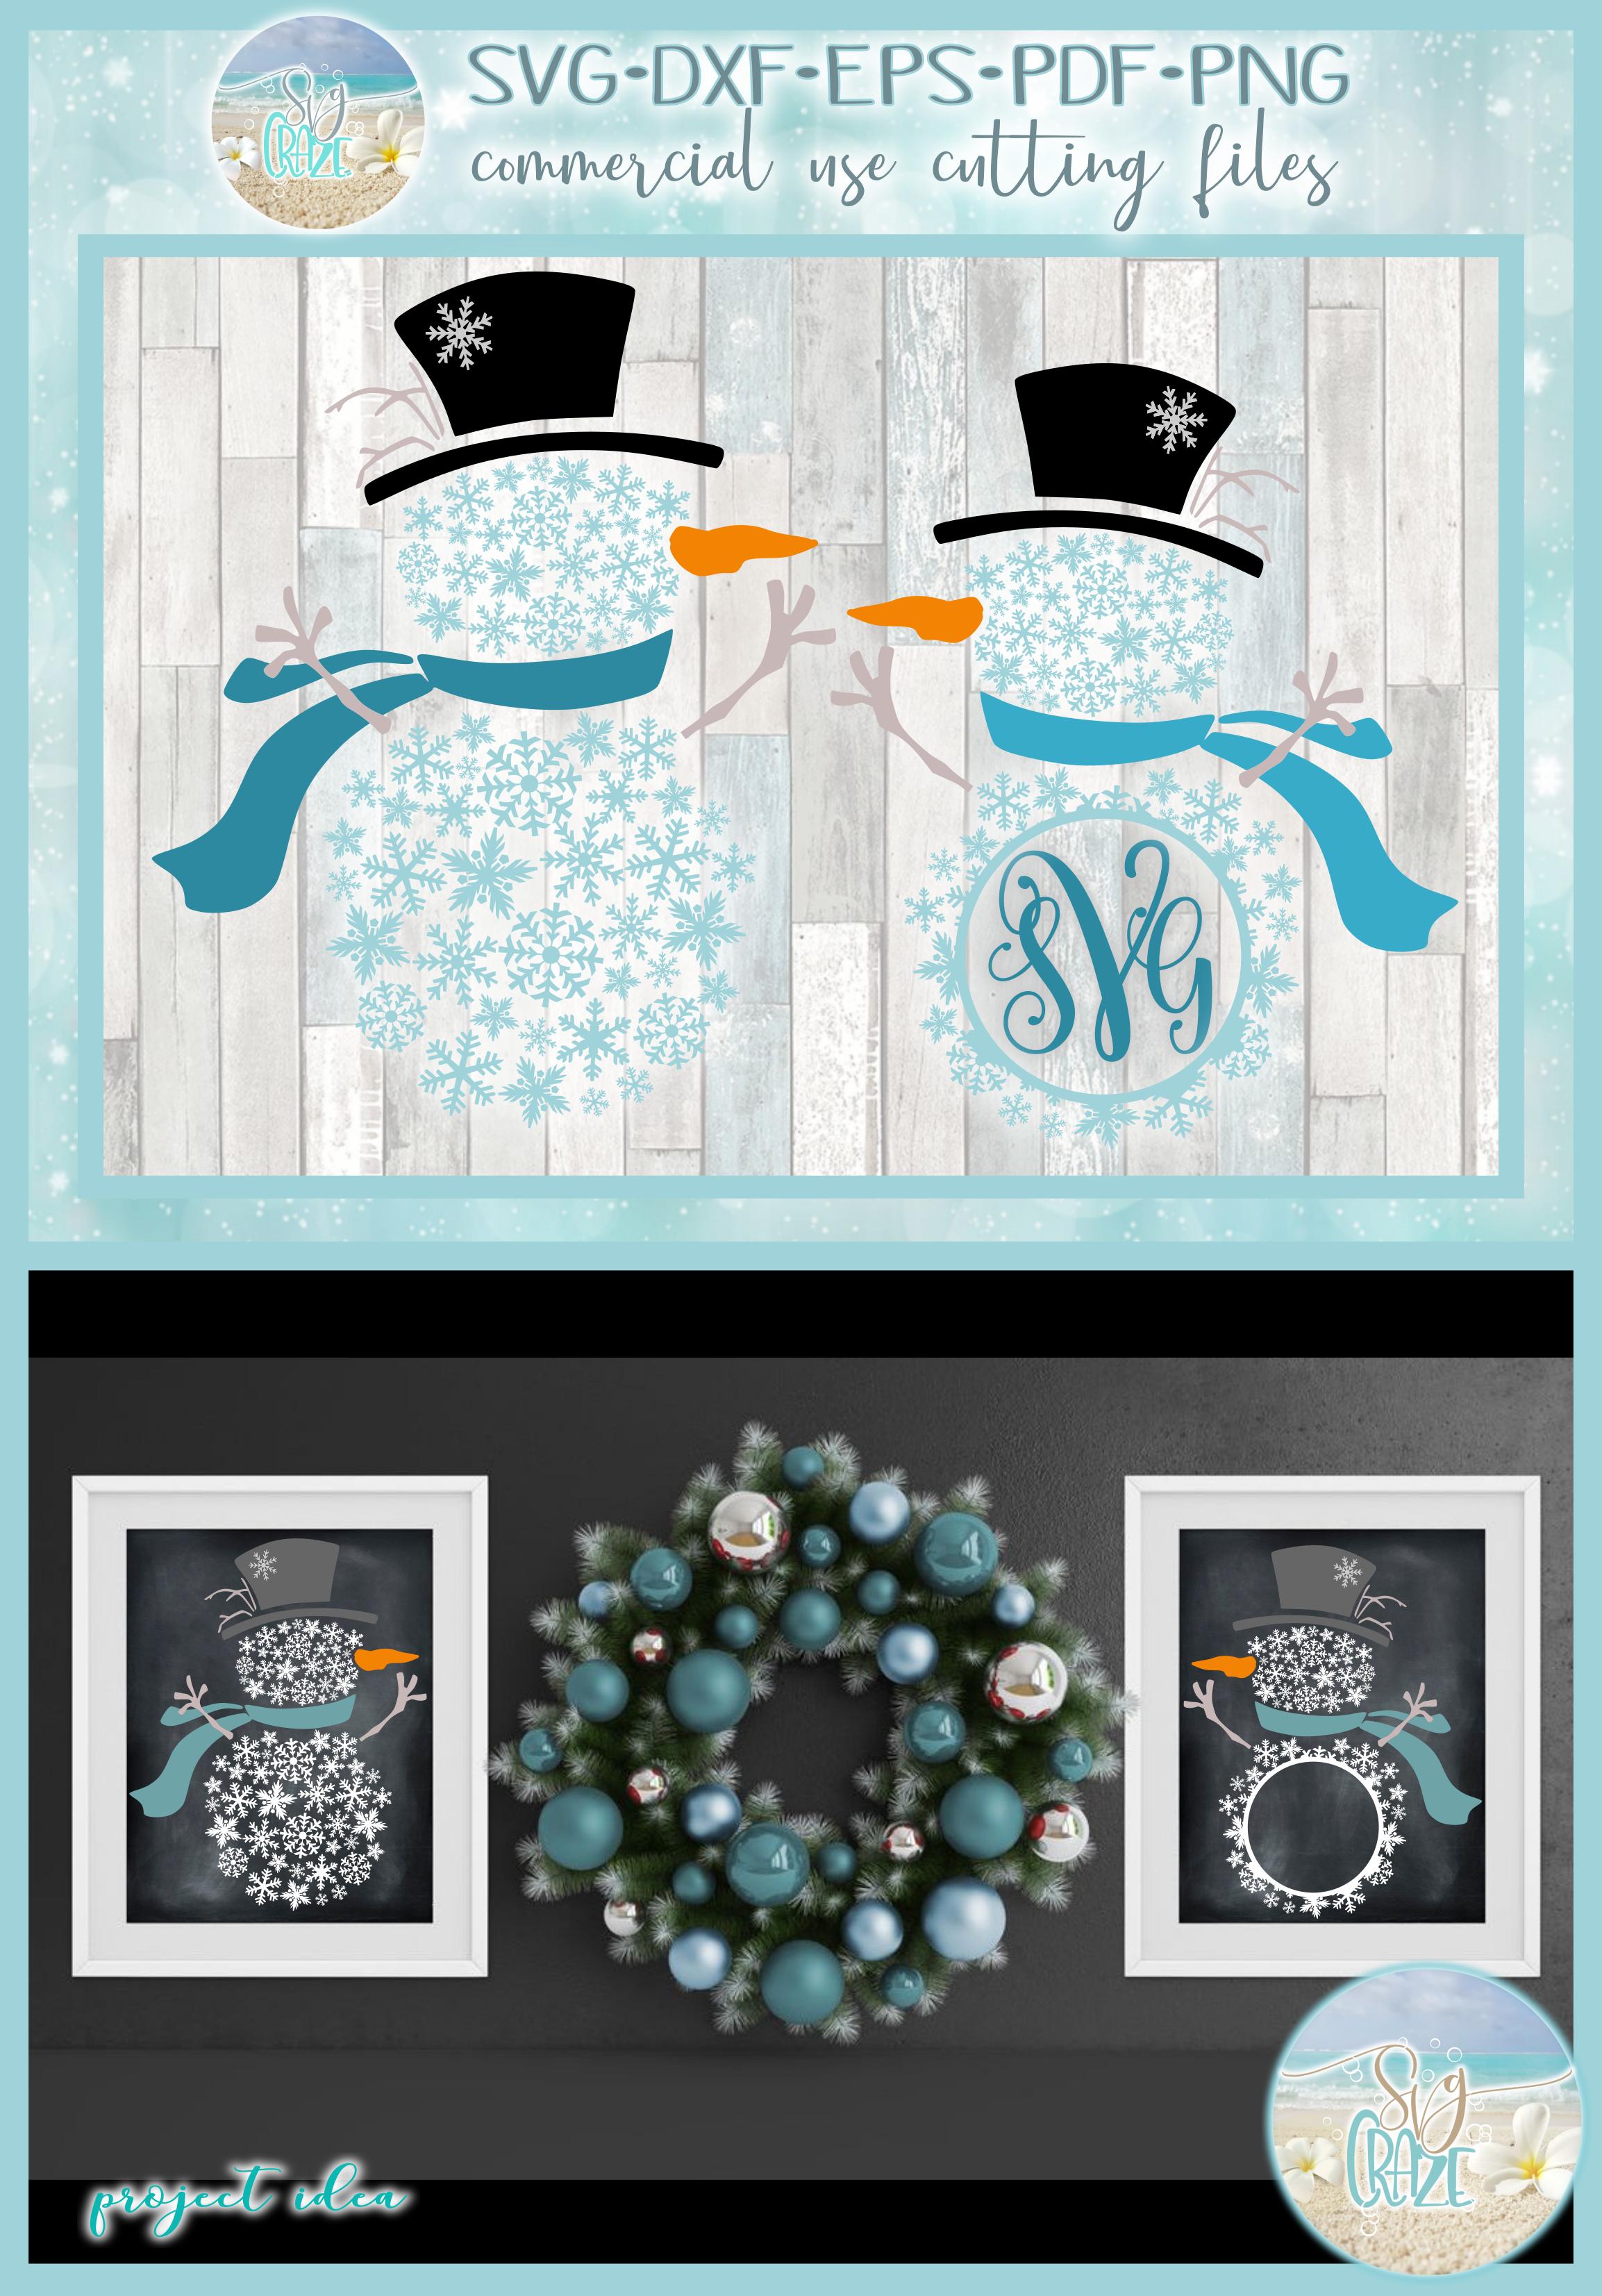 Snowflakes Snowman Monogram Svg Dxf Eps Png Pdf example image 4